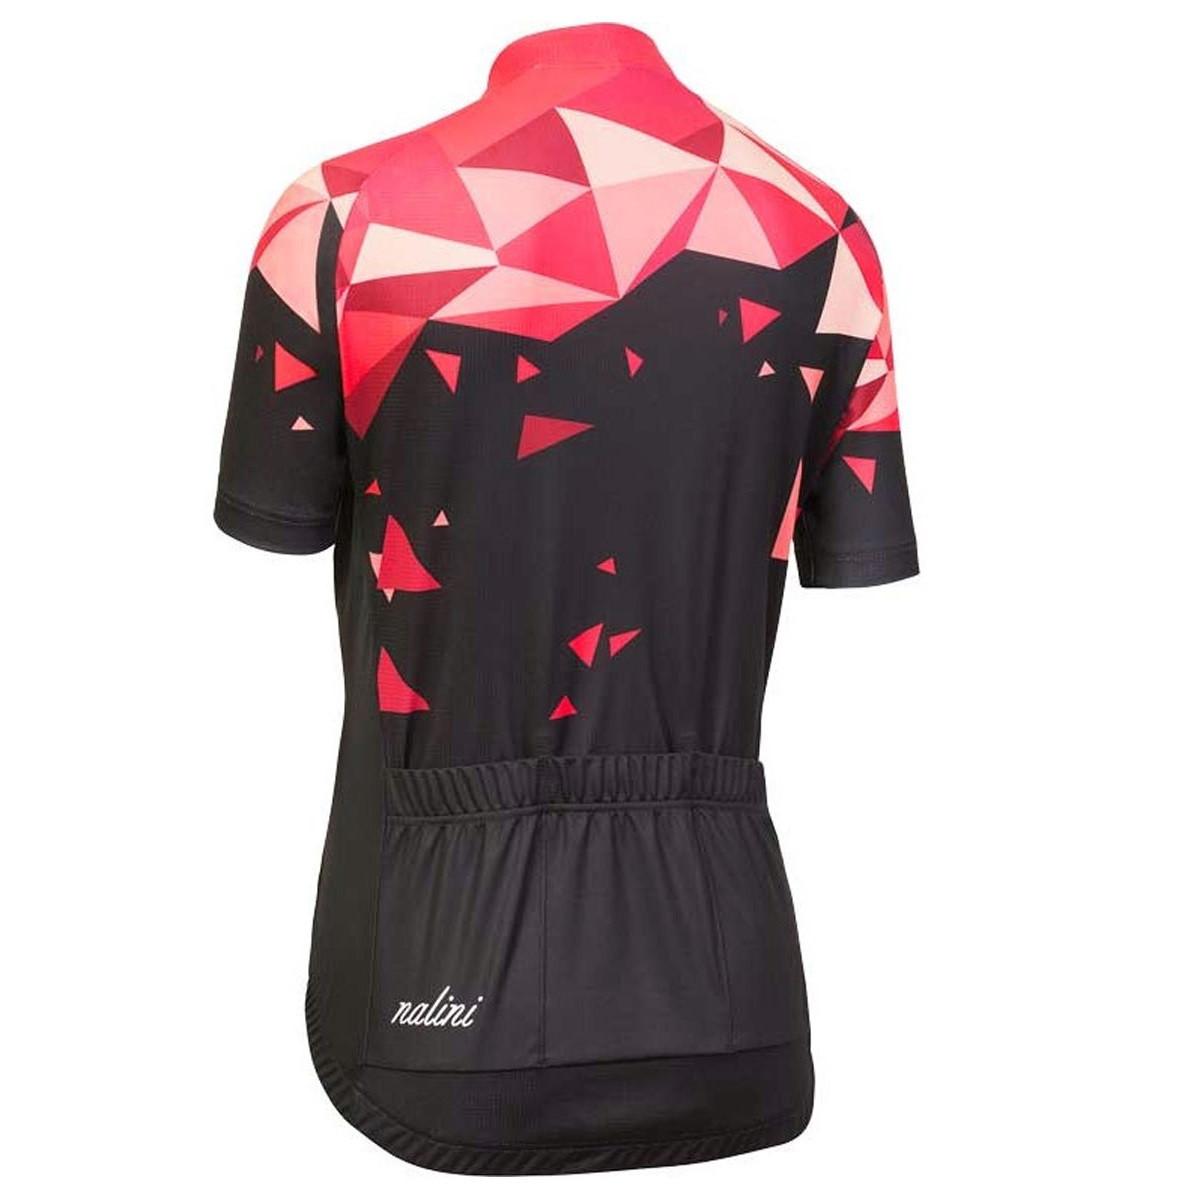 Женская короткая велоформа Nalini CHIC Women s Cycling Jersey And Shorts Set - фото 2